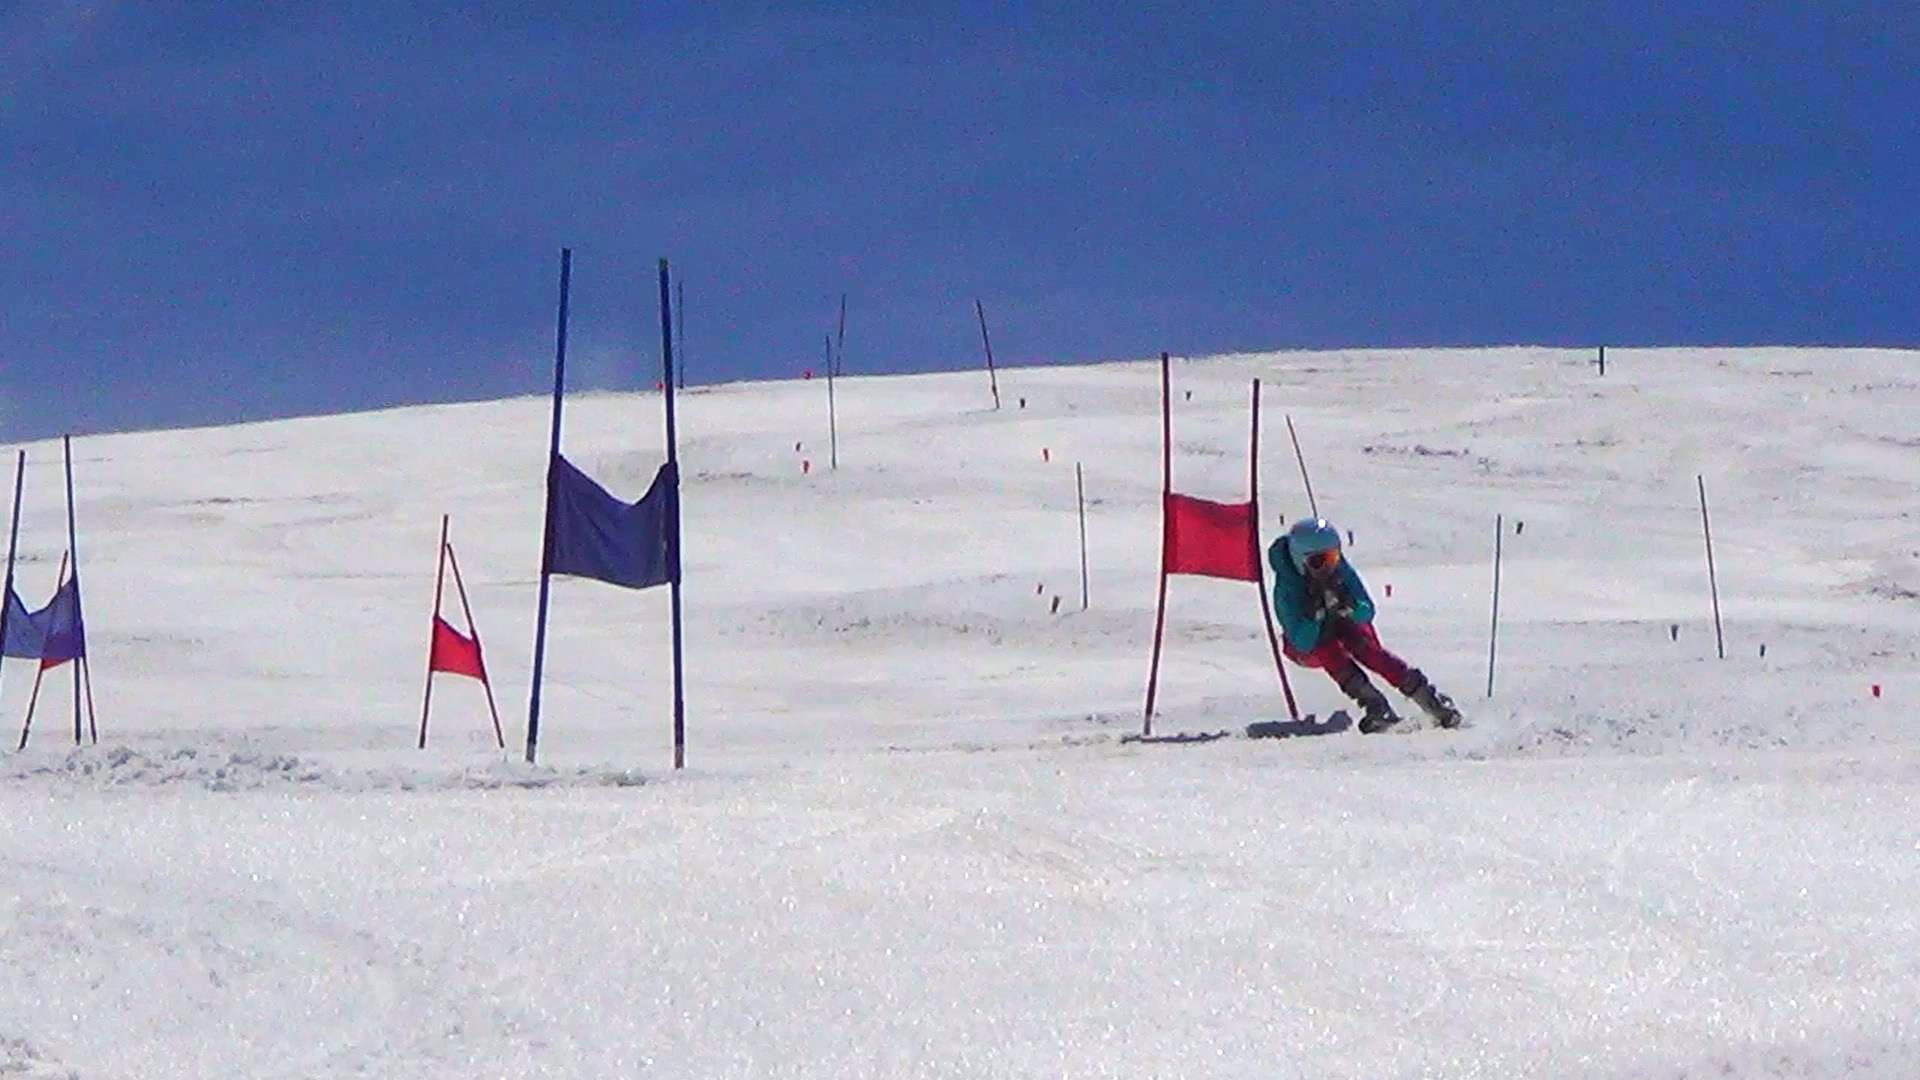 Kids Ski Race Training